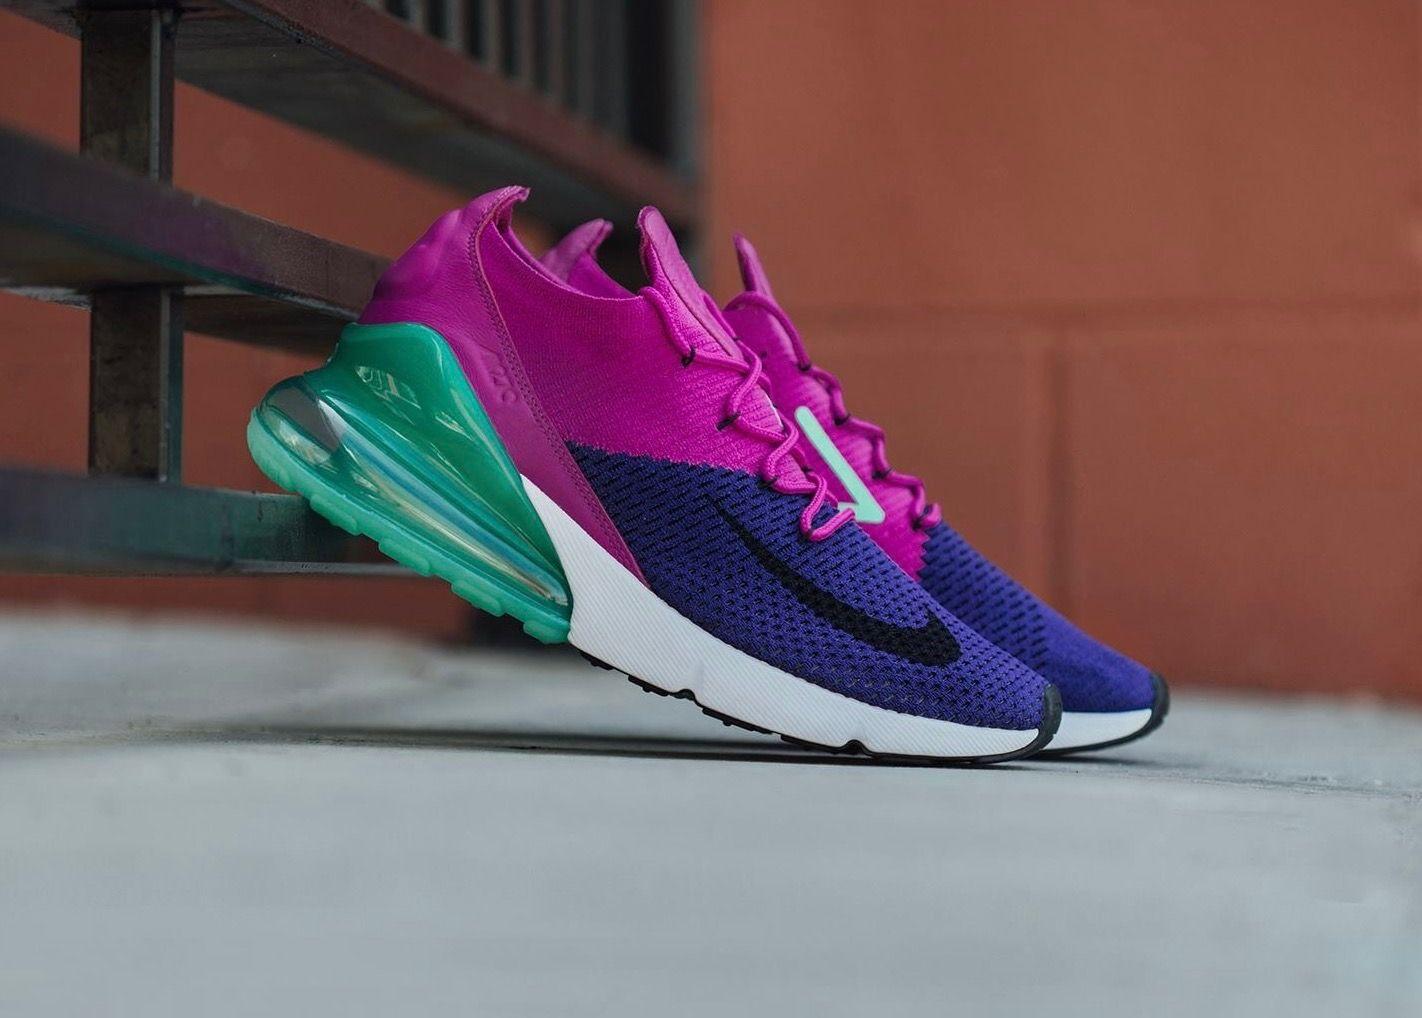 Nike Air Max 270 Shoes n watches n ish... Pinterest